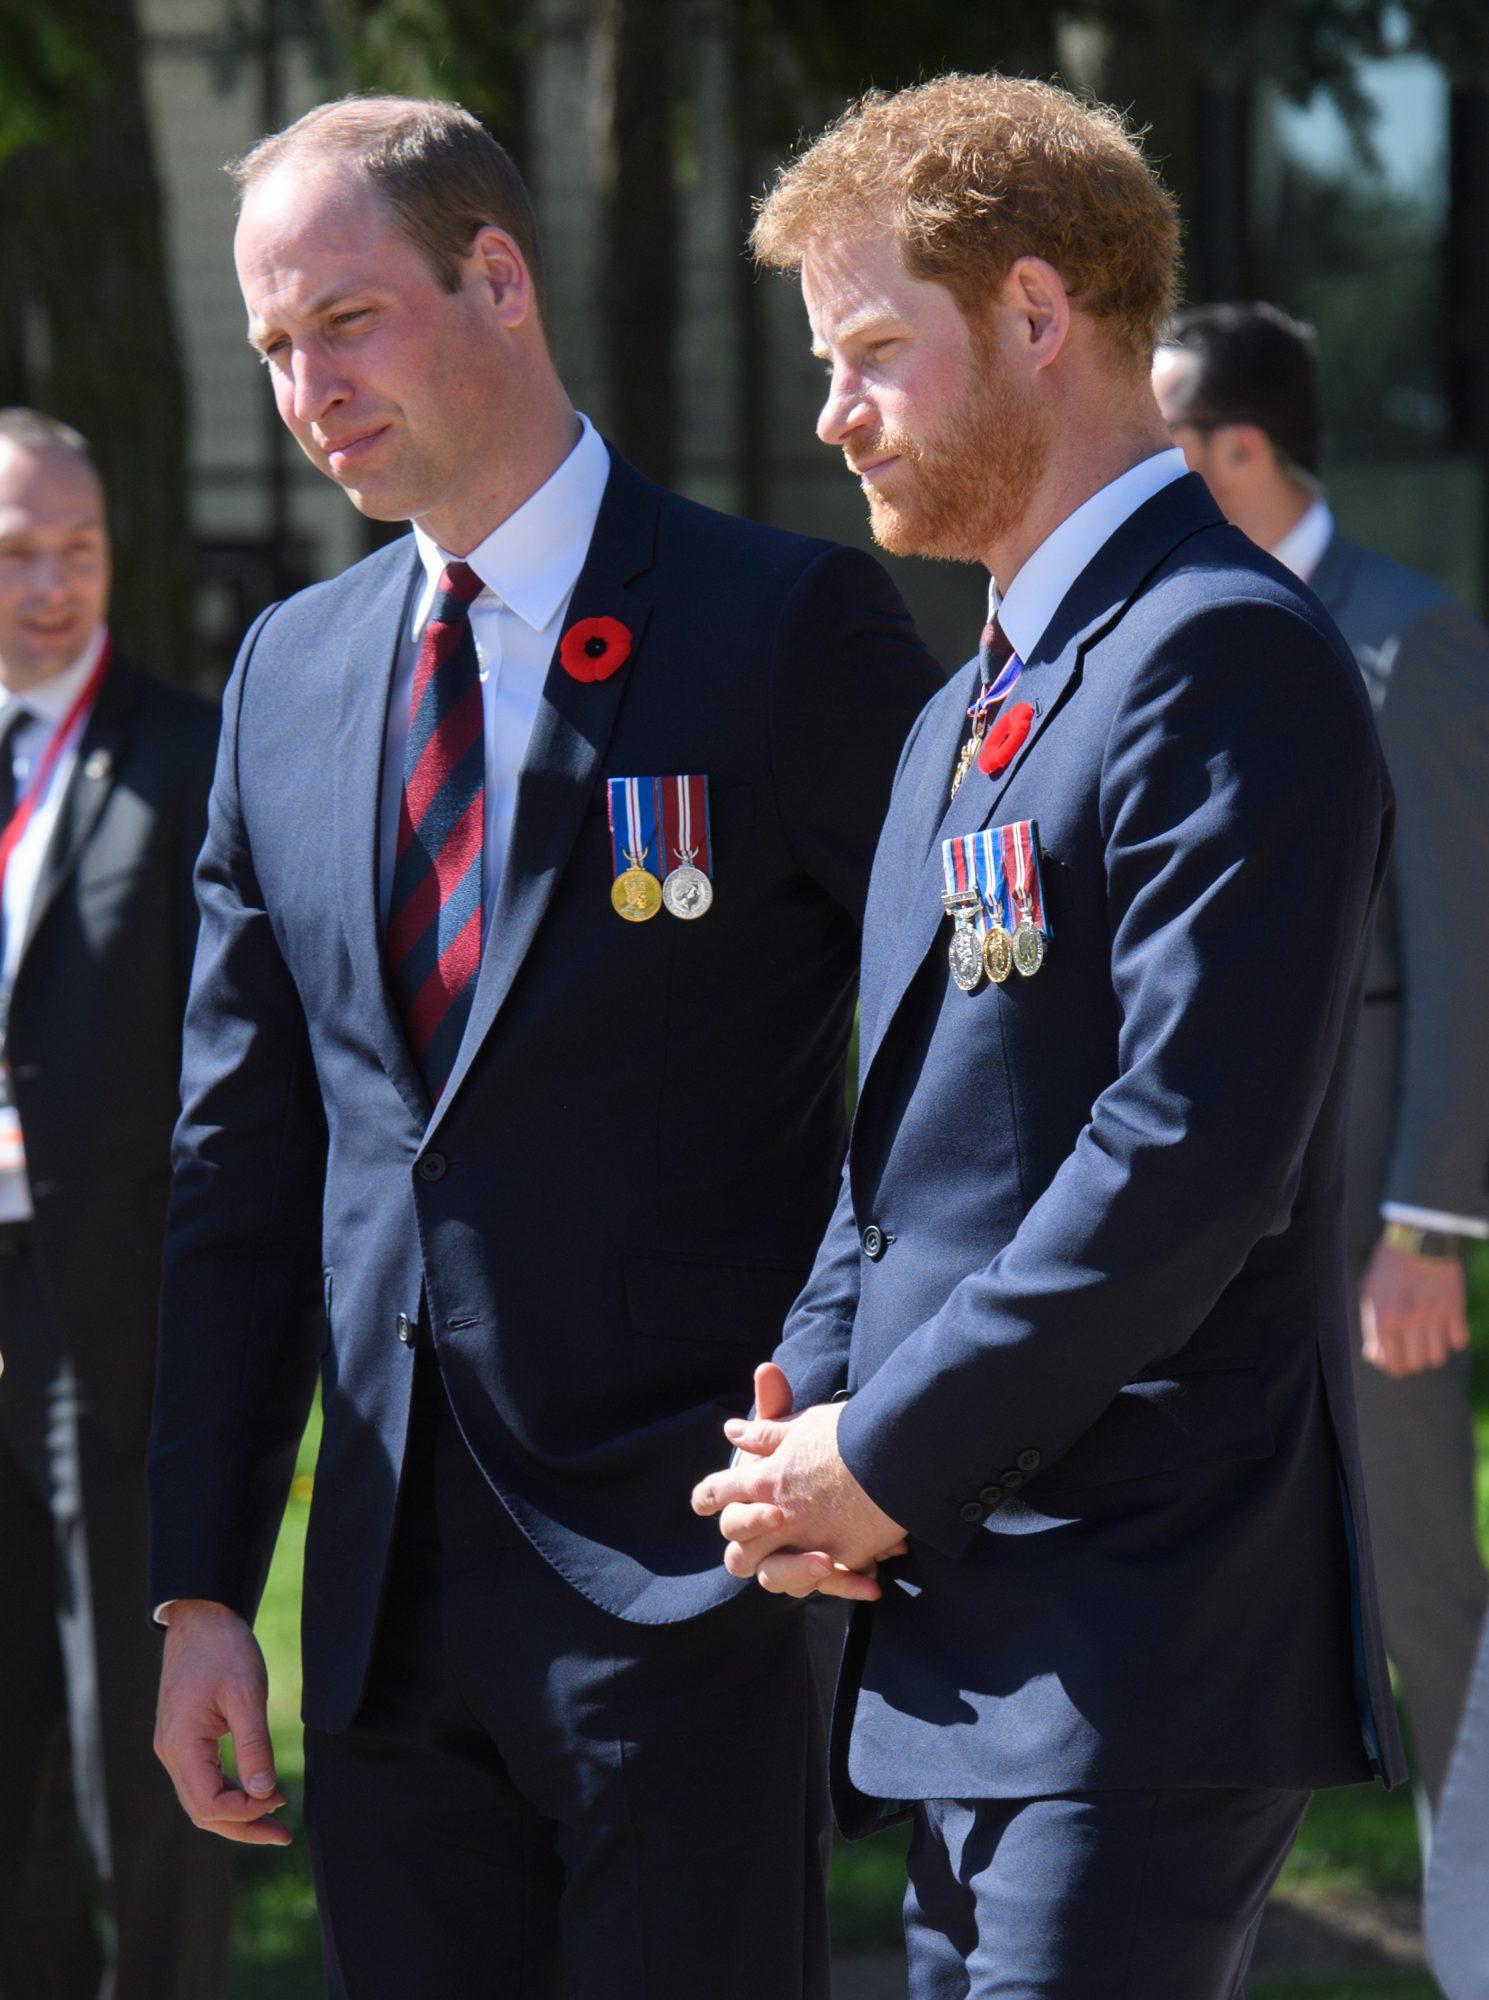 Príncipe William, príncipe Harry